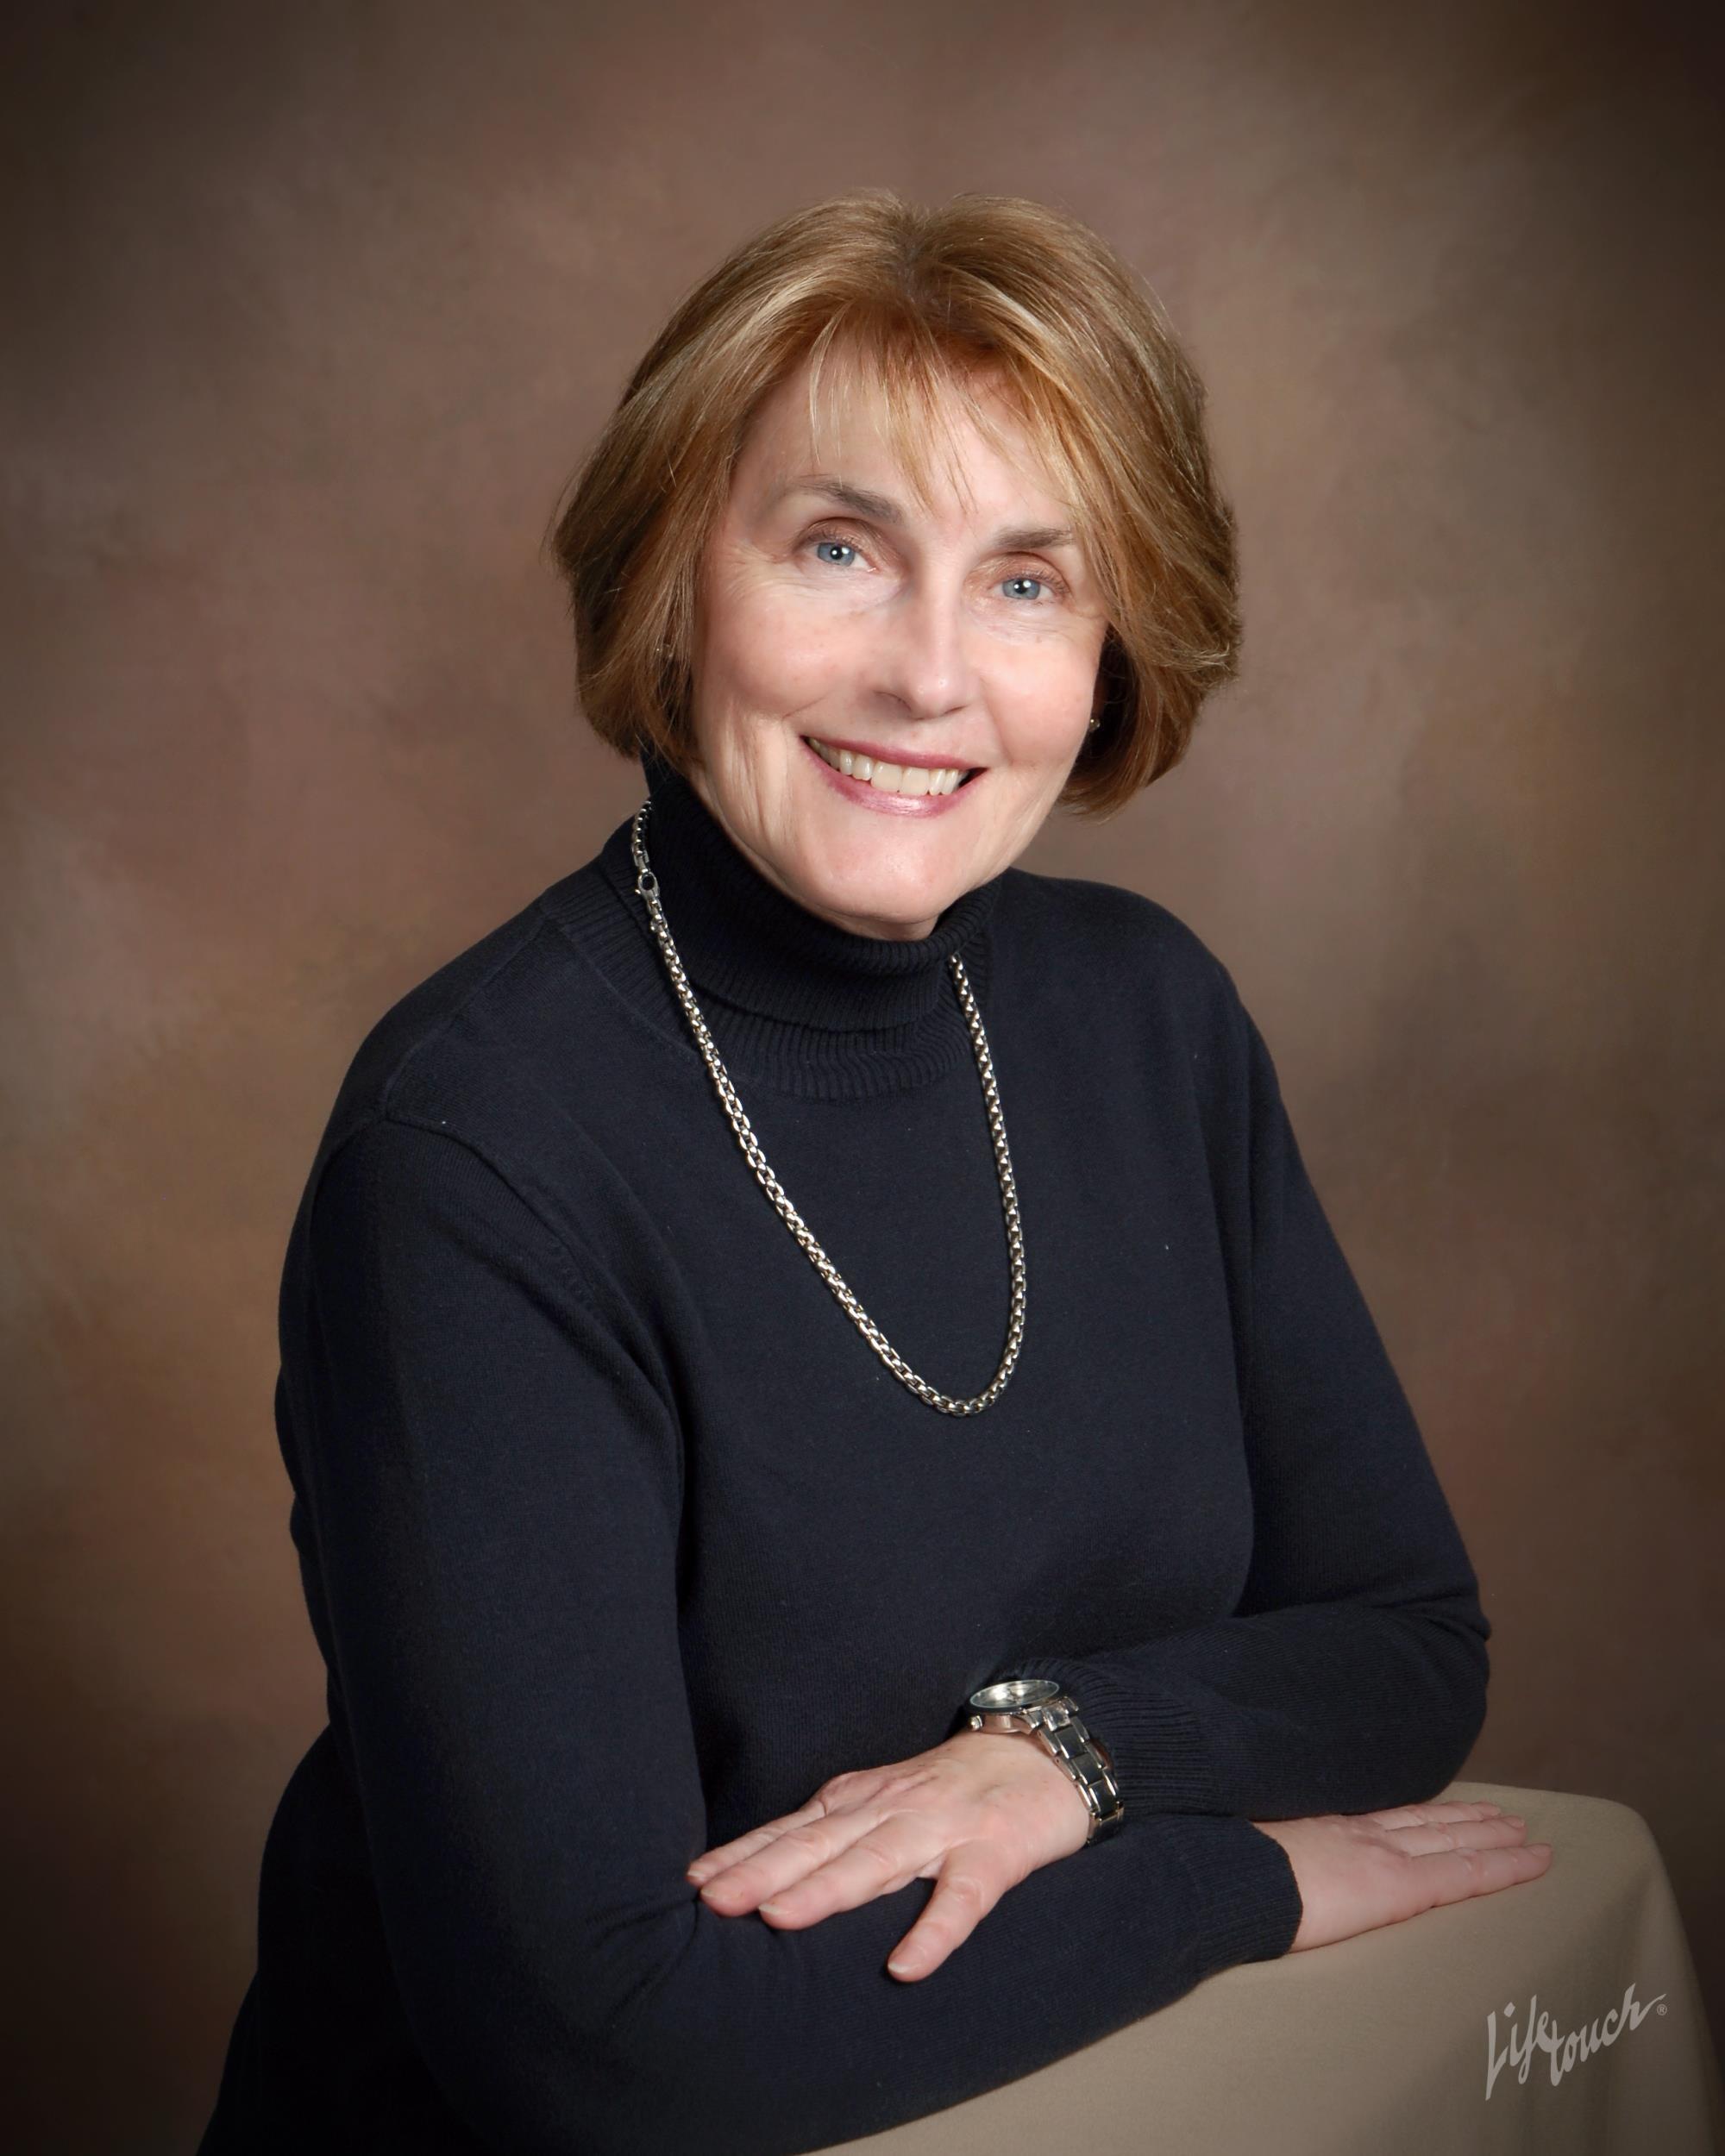 PAG Kathy Kanter - Secretary    Strasburg, Virginia, District 7570